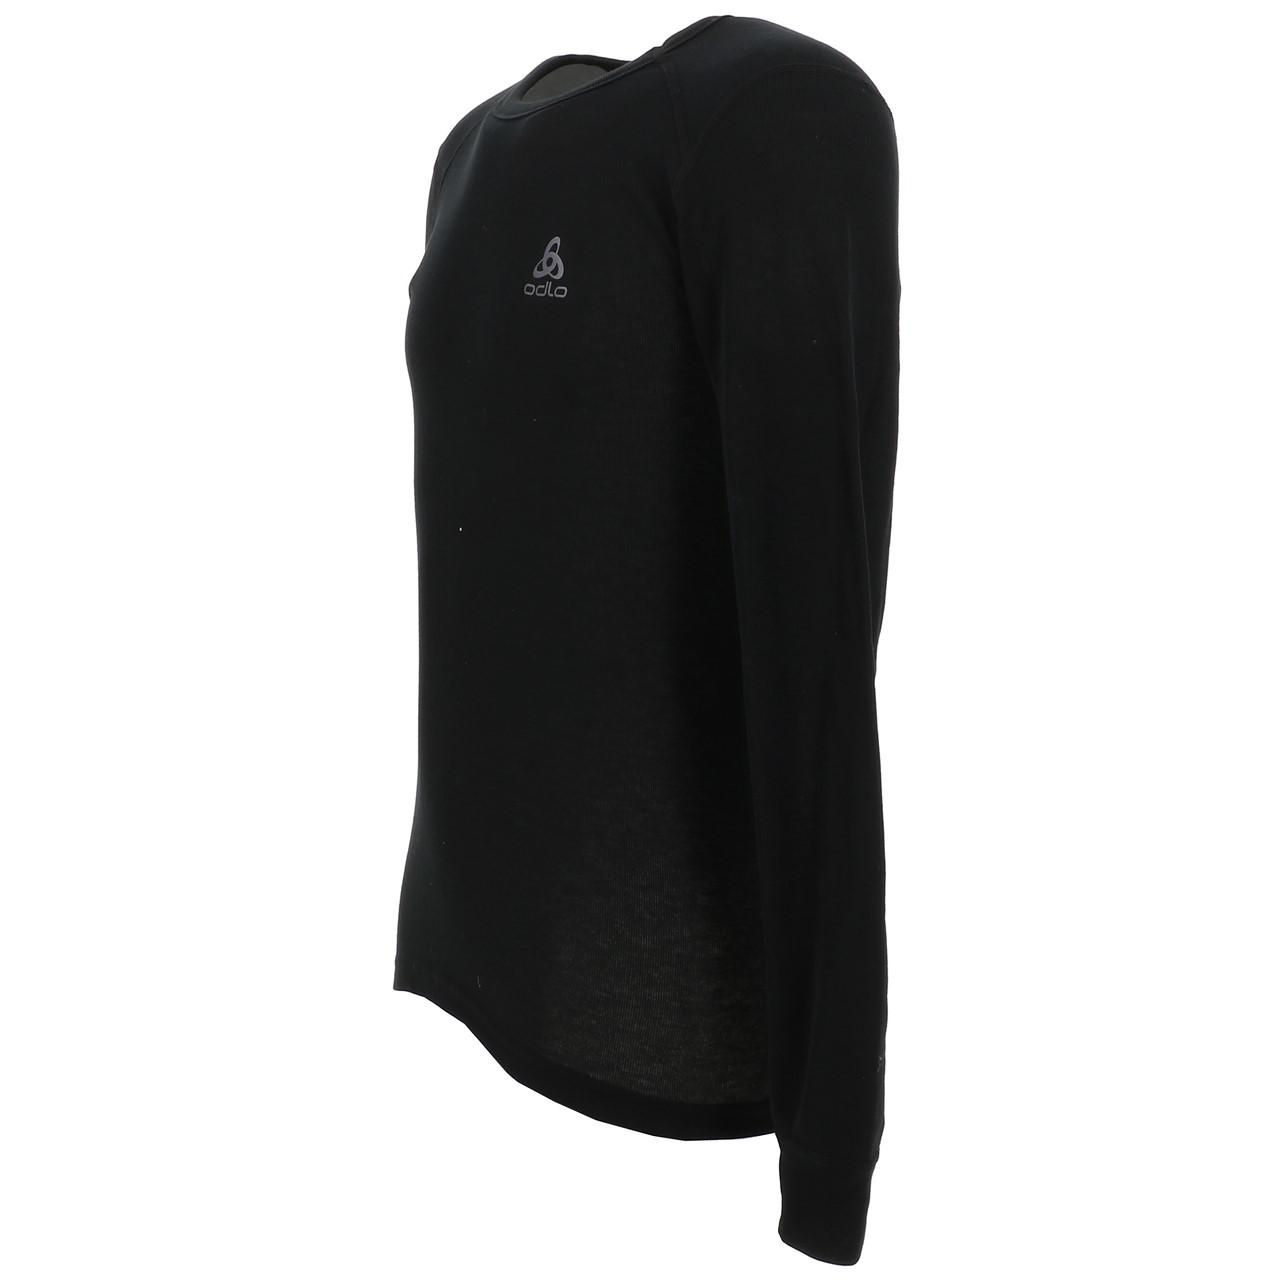 Under-Clothing-Thermal-Hot-Odlo-Warm-Black-DRC-ML-Tee-Black-85353-New thumbnail 4